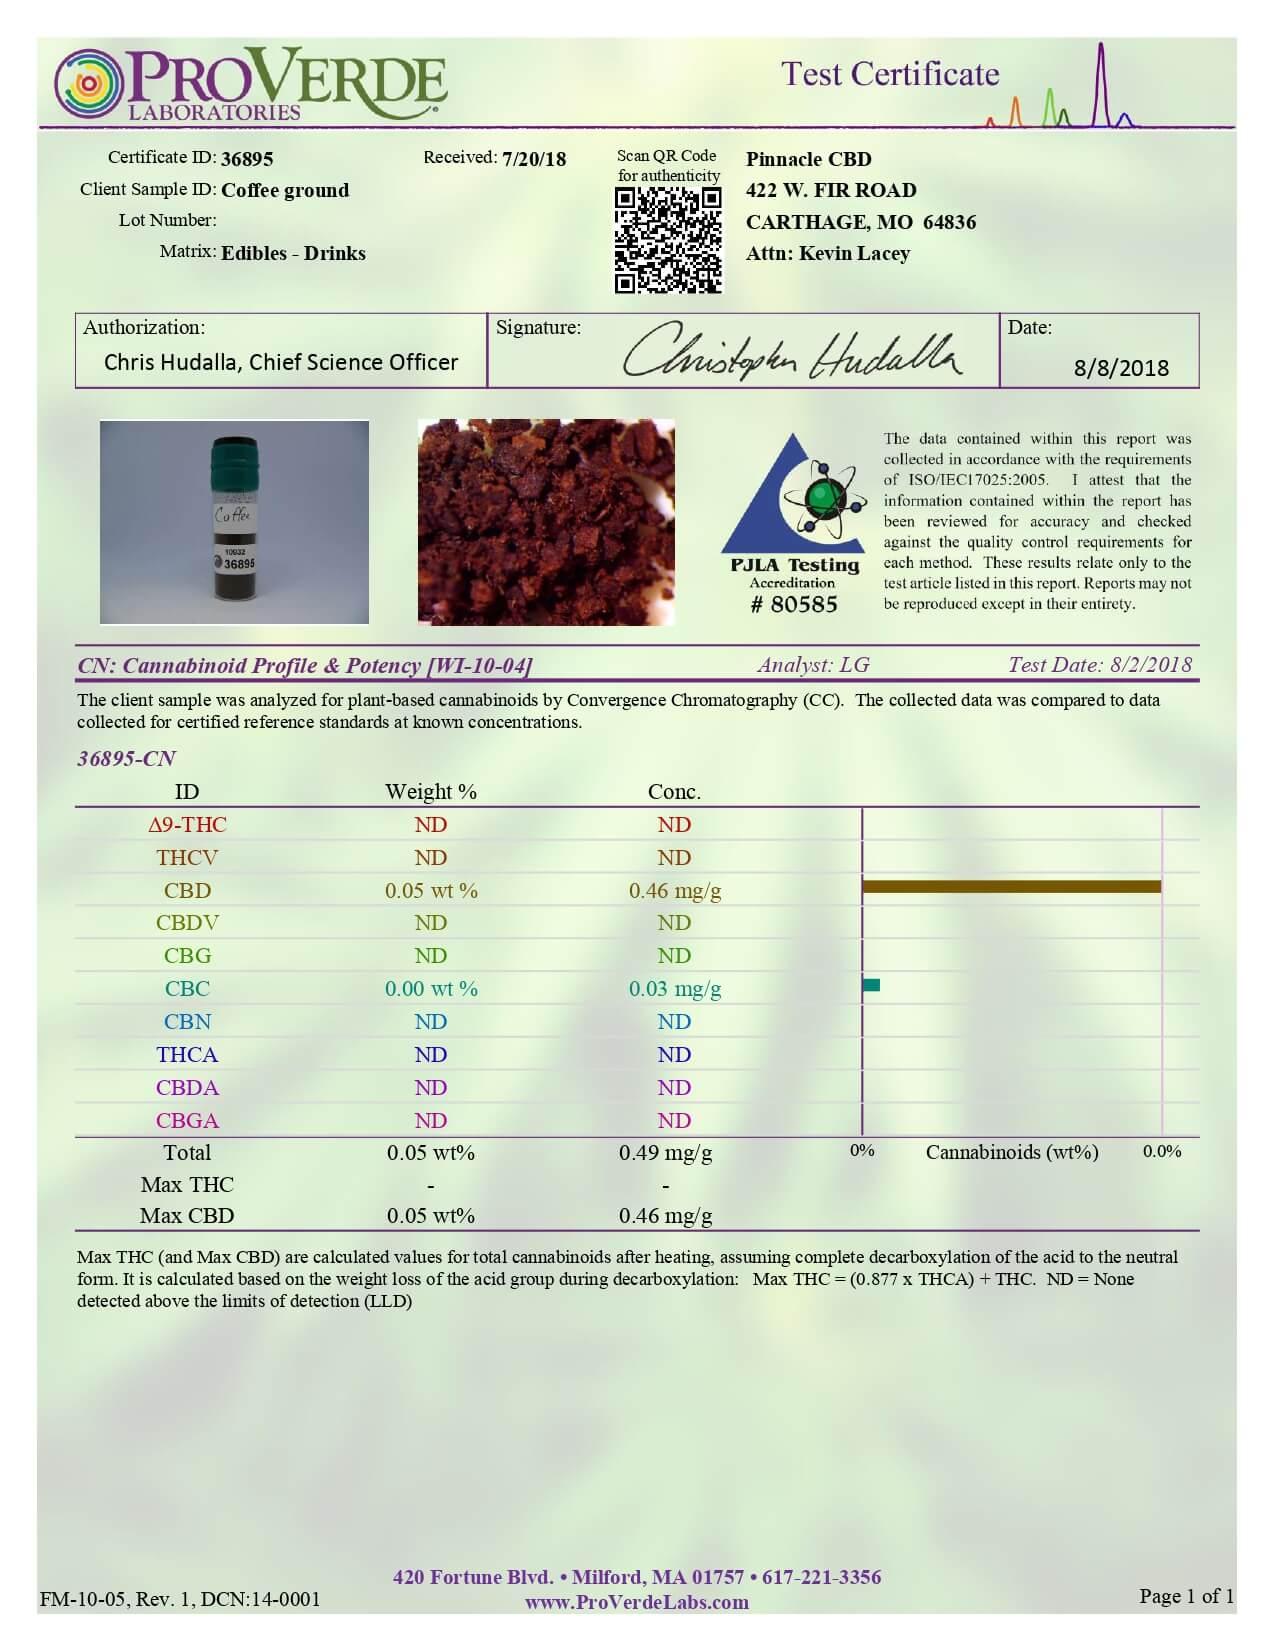 Pinnacle Hemp CBD Coffee Full Spectrum Ground Coffee Lab Report